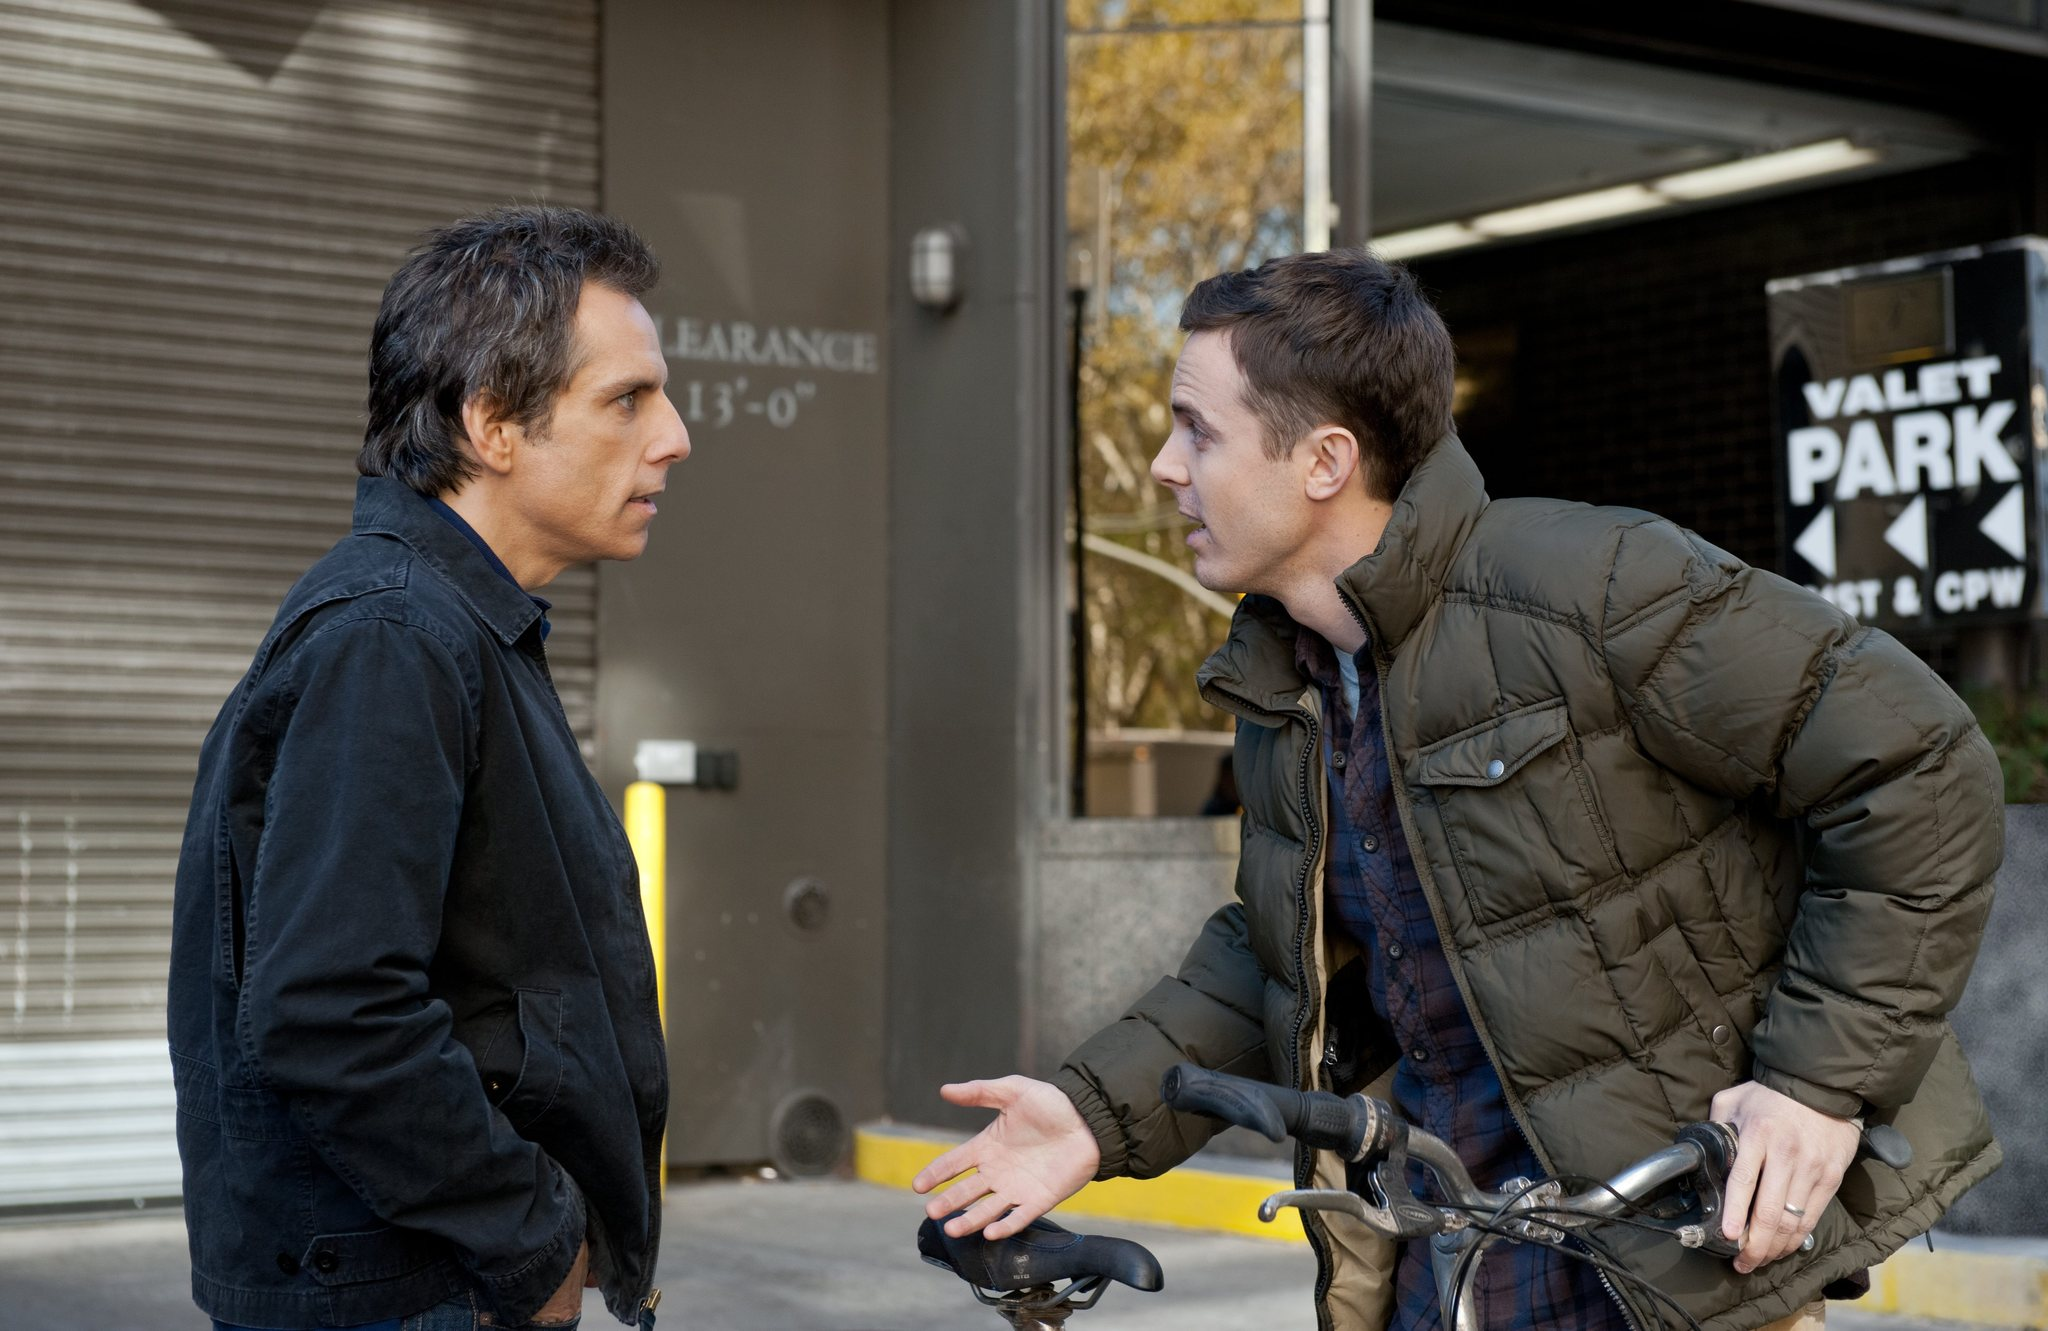 Casey Affleck and Ben Stiller in Tower Heist (2011)